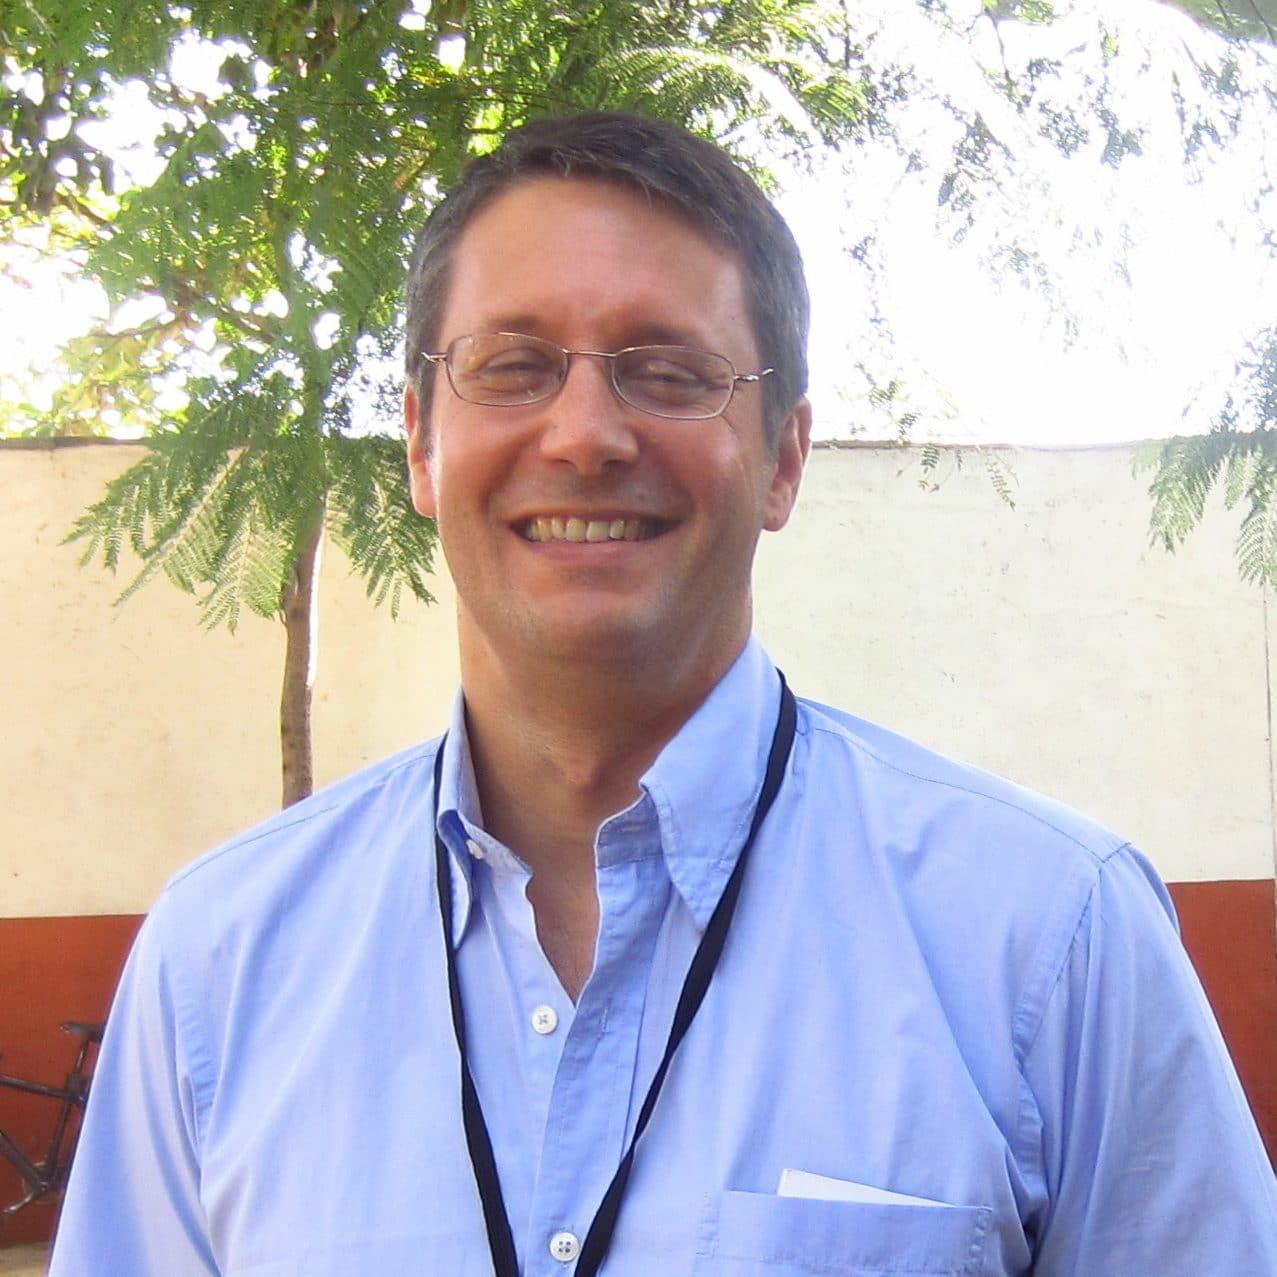 Marc Lundy